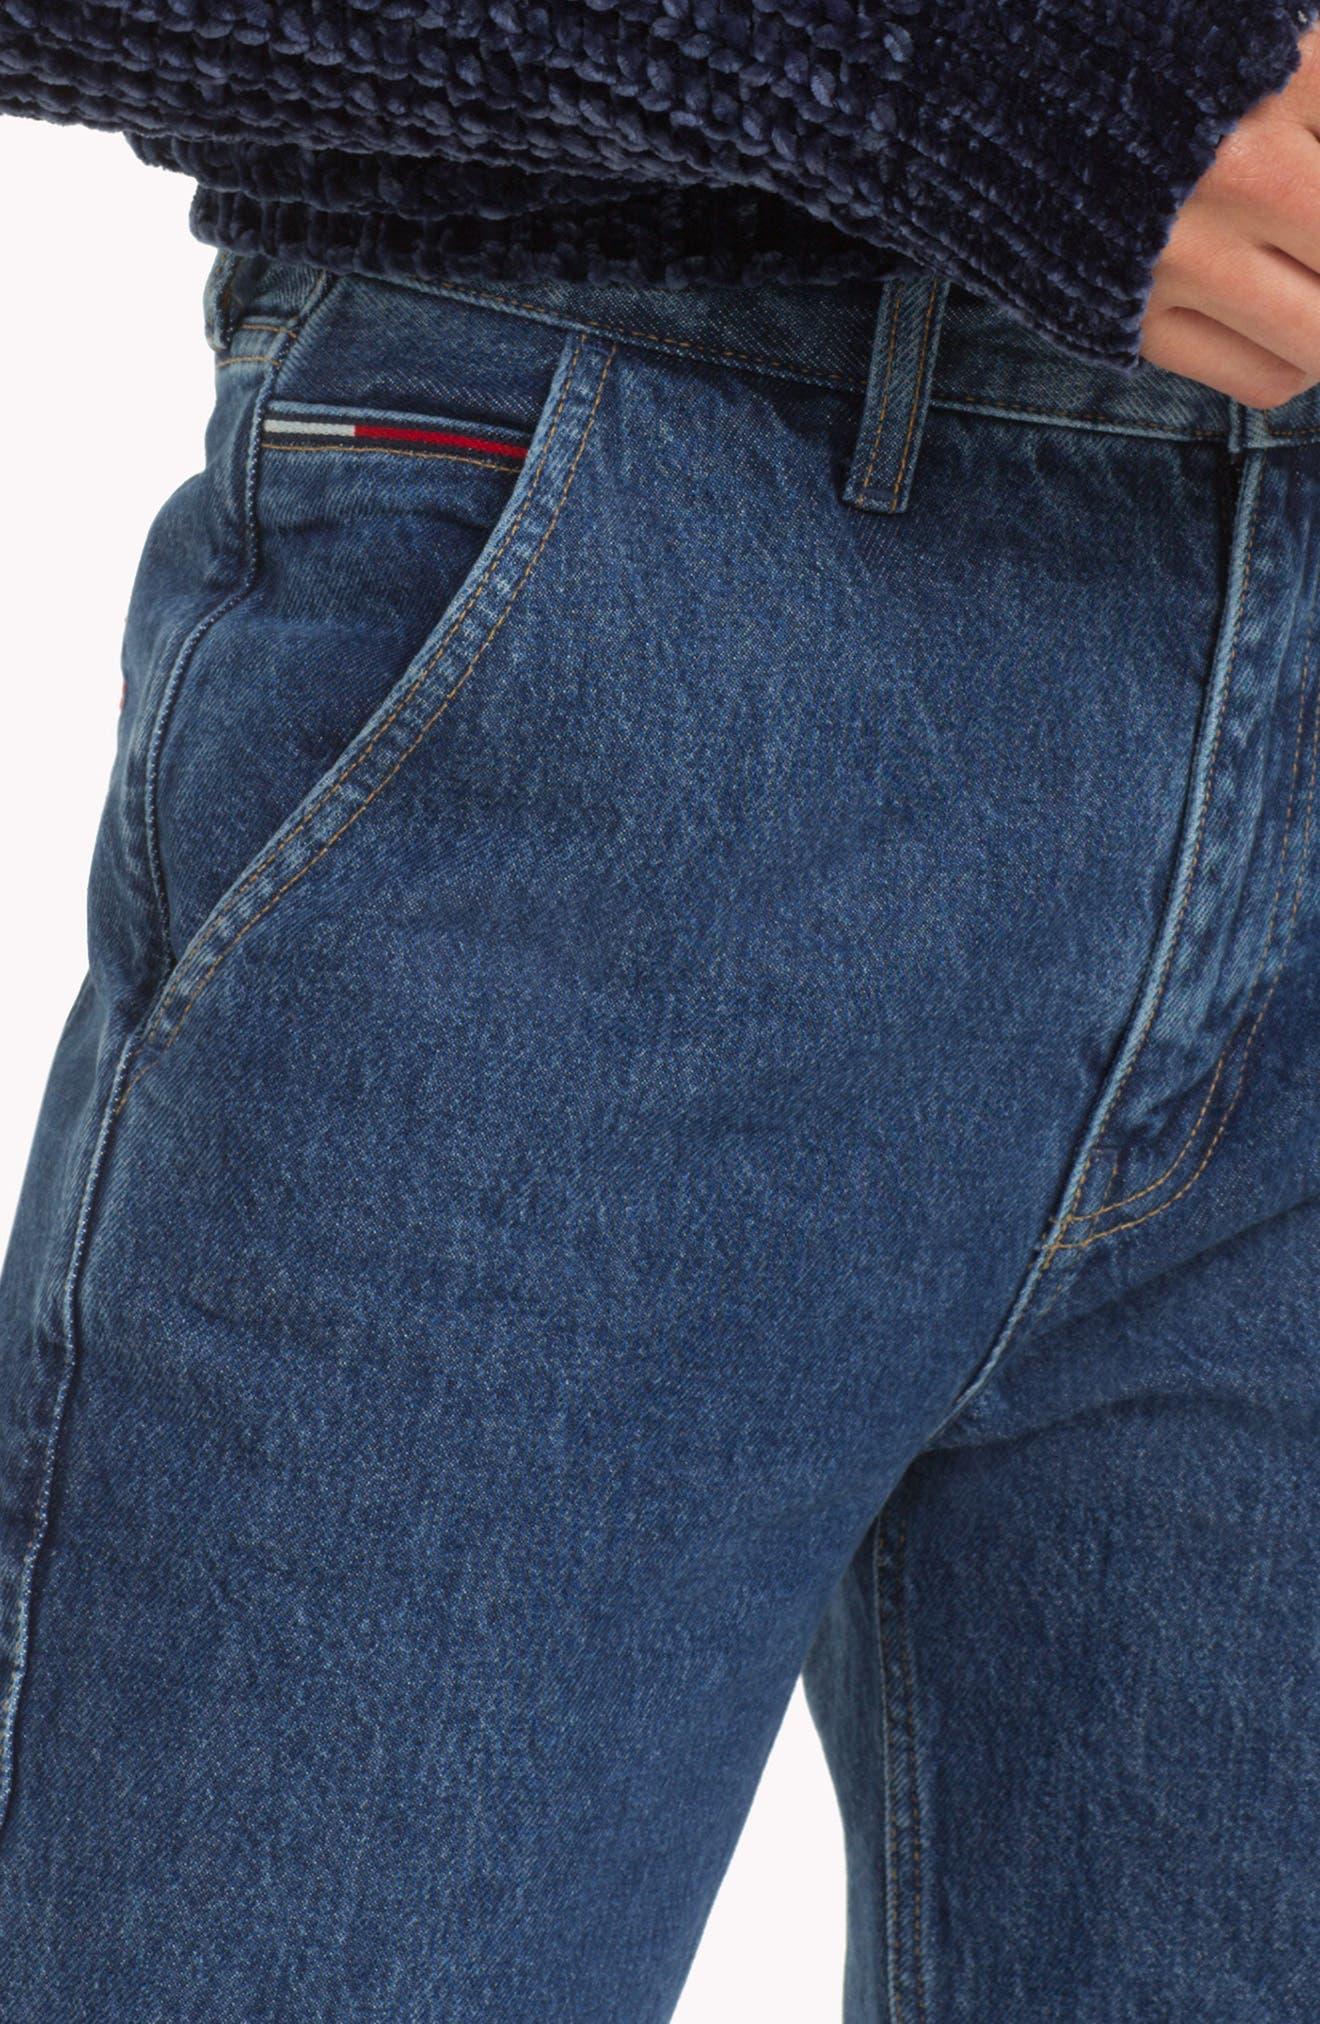 TJW Straight Leg Jeans,                             Alternate thumbnail 6, color,                             GOUGH MID BLUE RIGID